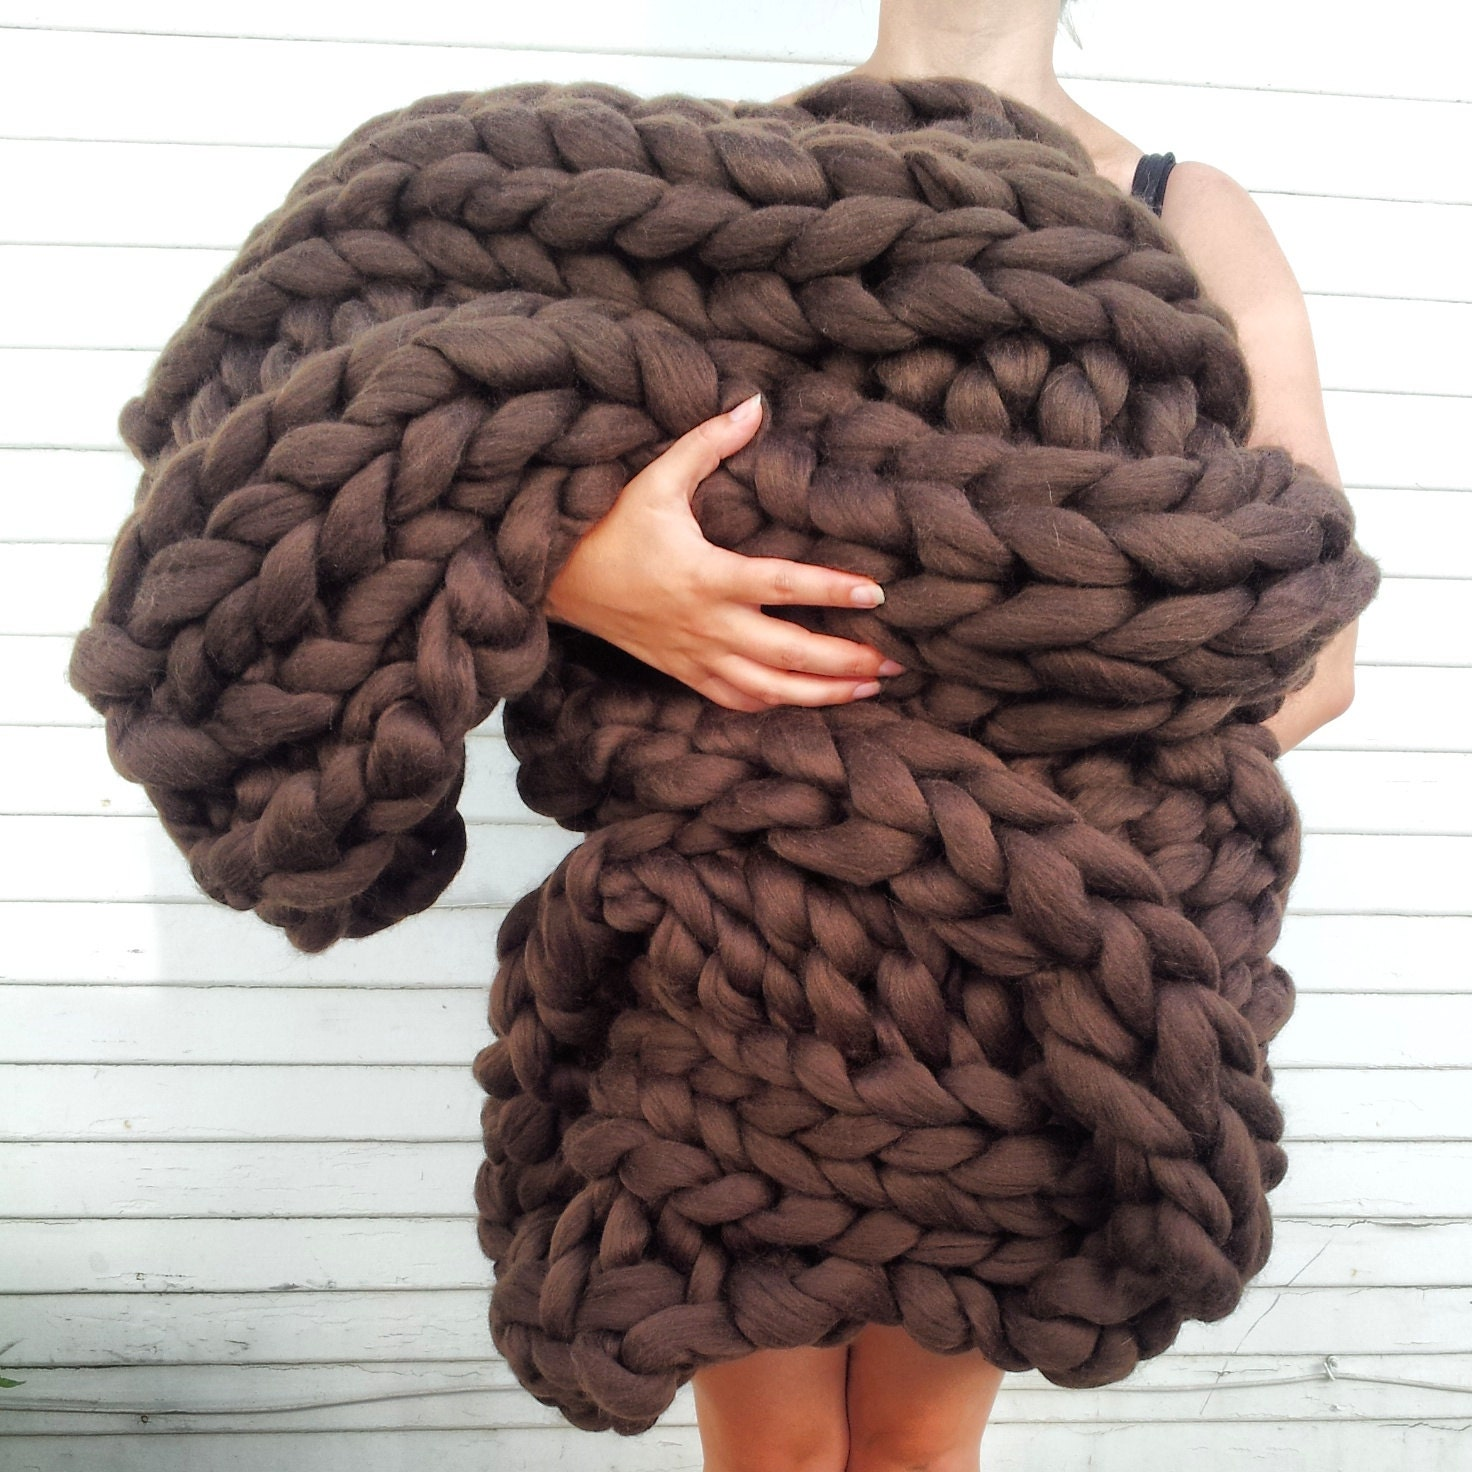 Super Chunky Knit Merino Blanket 40 X 58 Deep Brown Chunky